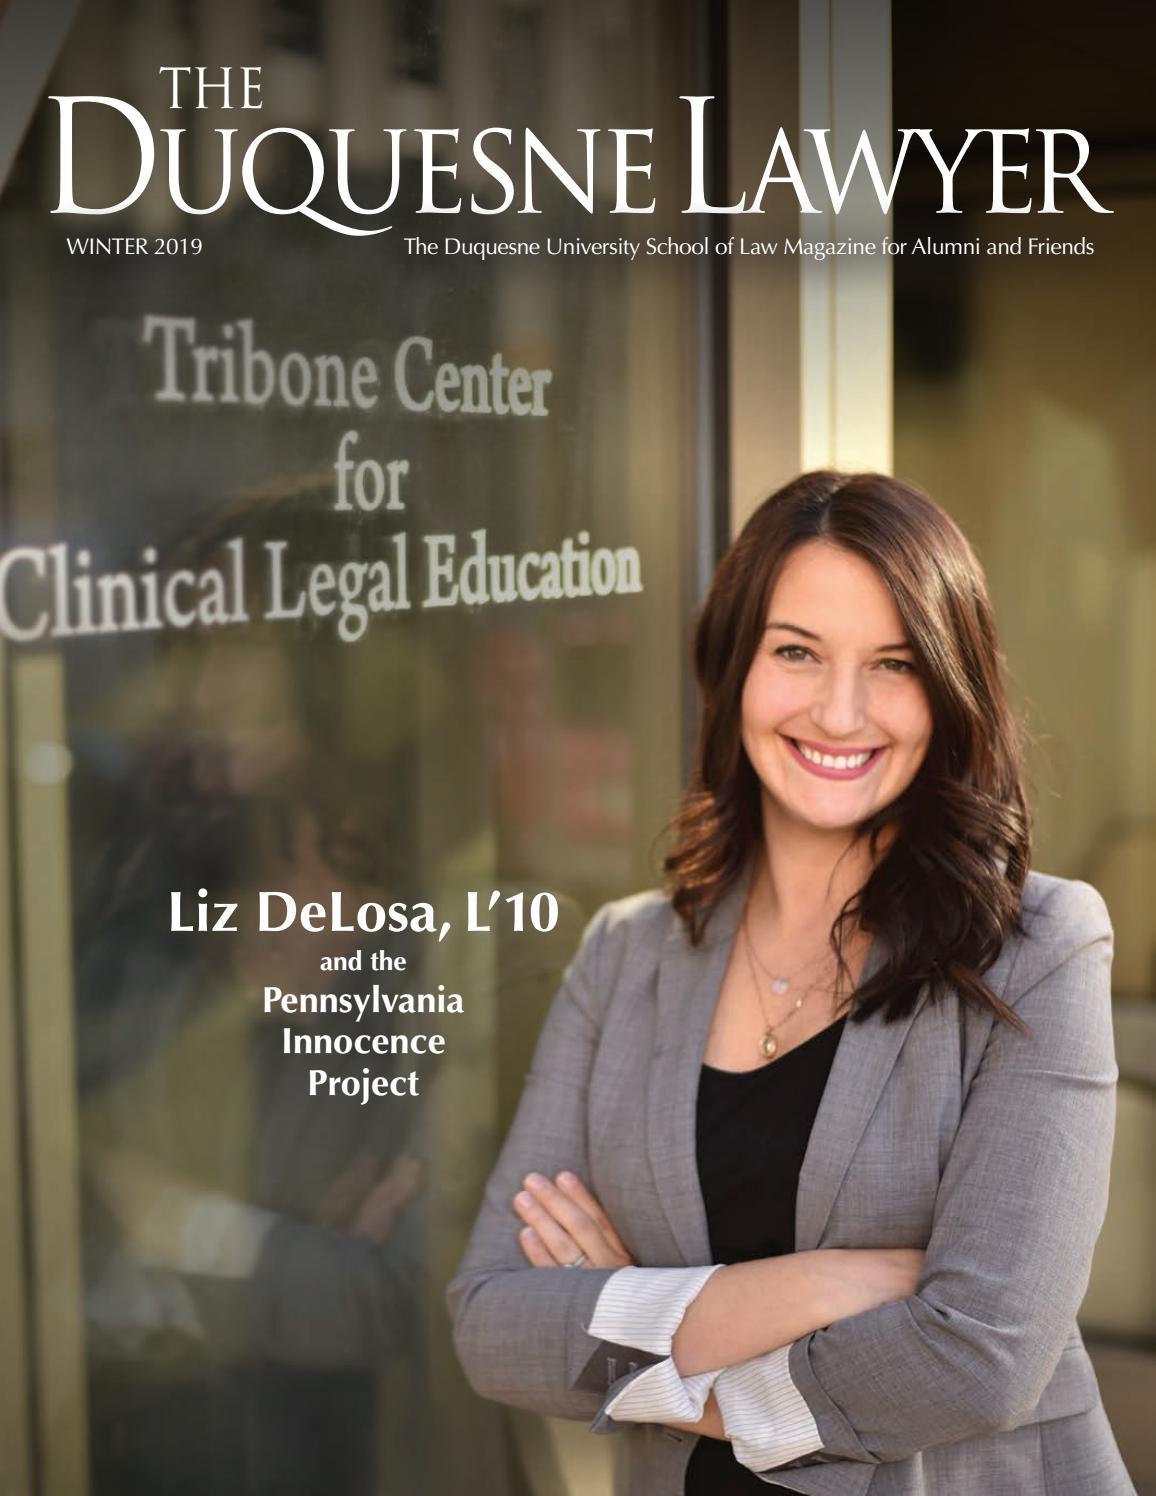 Duquesne Lawyer Magazine Fall Winter 2018 By Duquesne University School Of Law Issuu